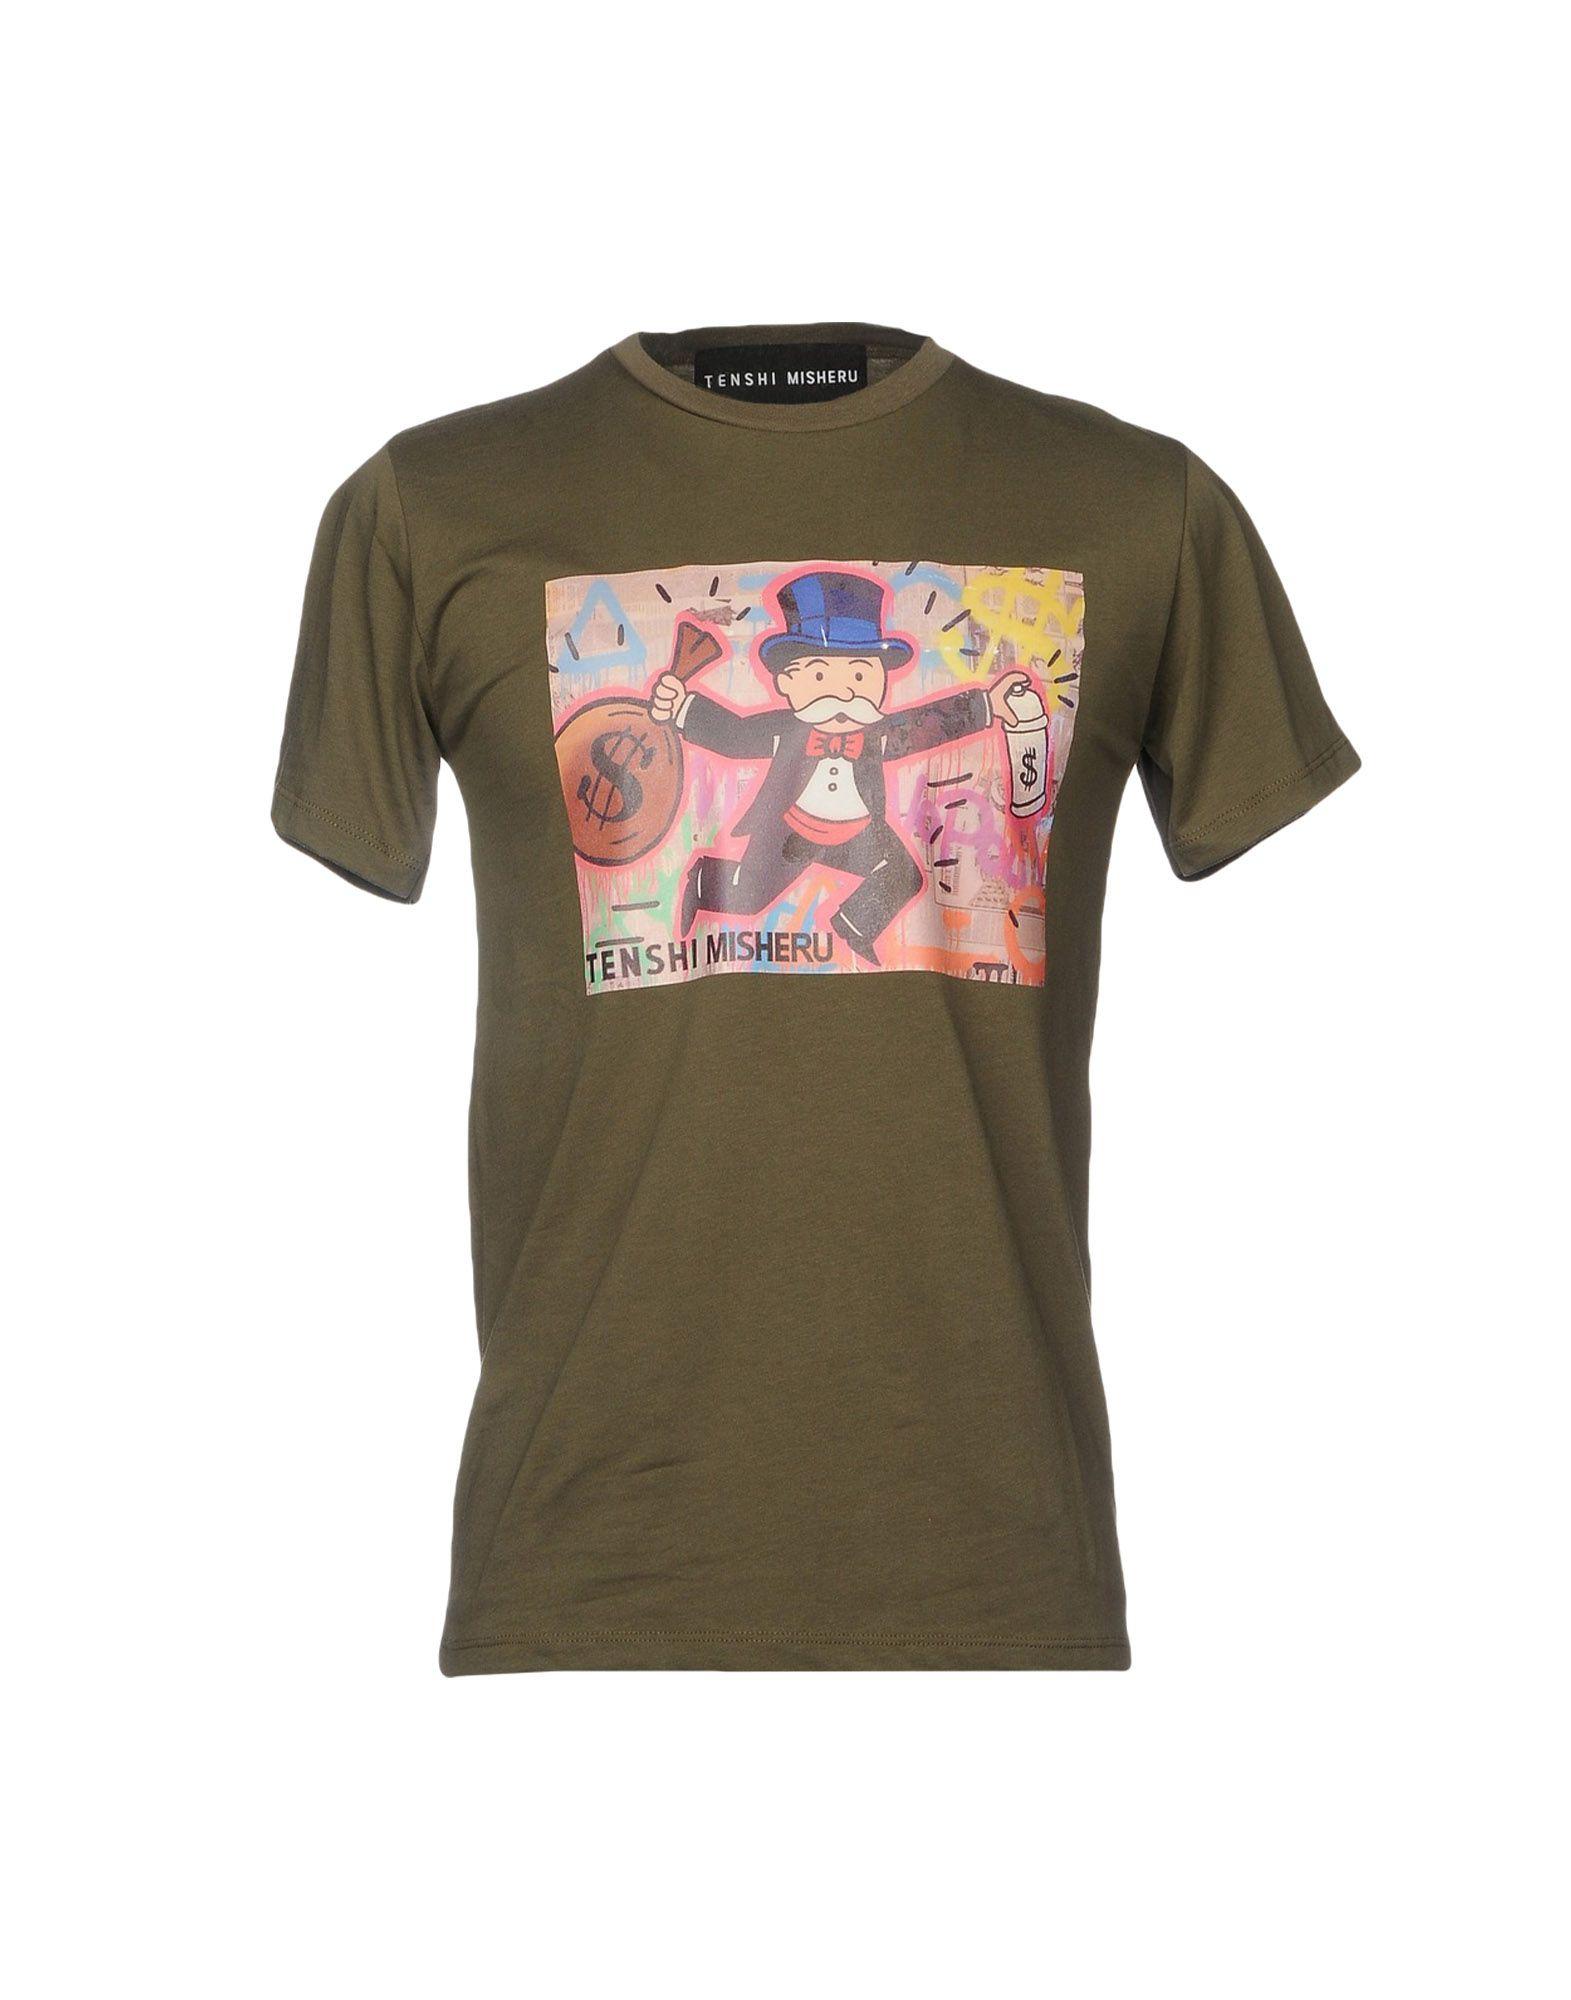 T-Shirt Tenshi Misheru Misheru Misheru Uomo - 12103489MJ 53af72